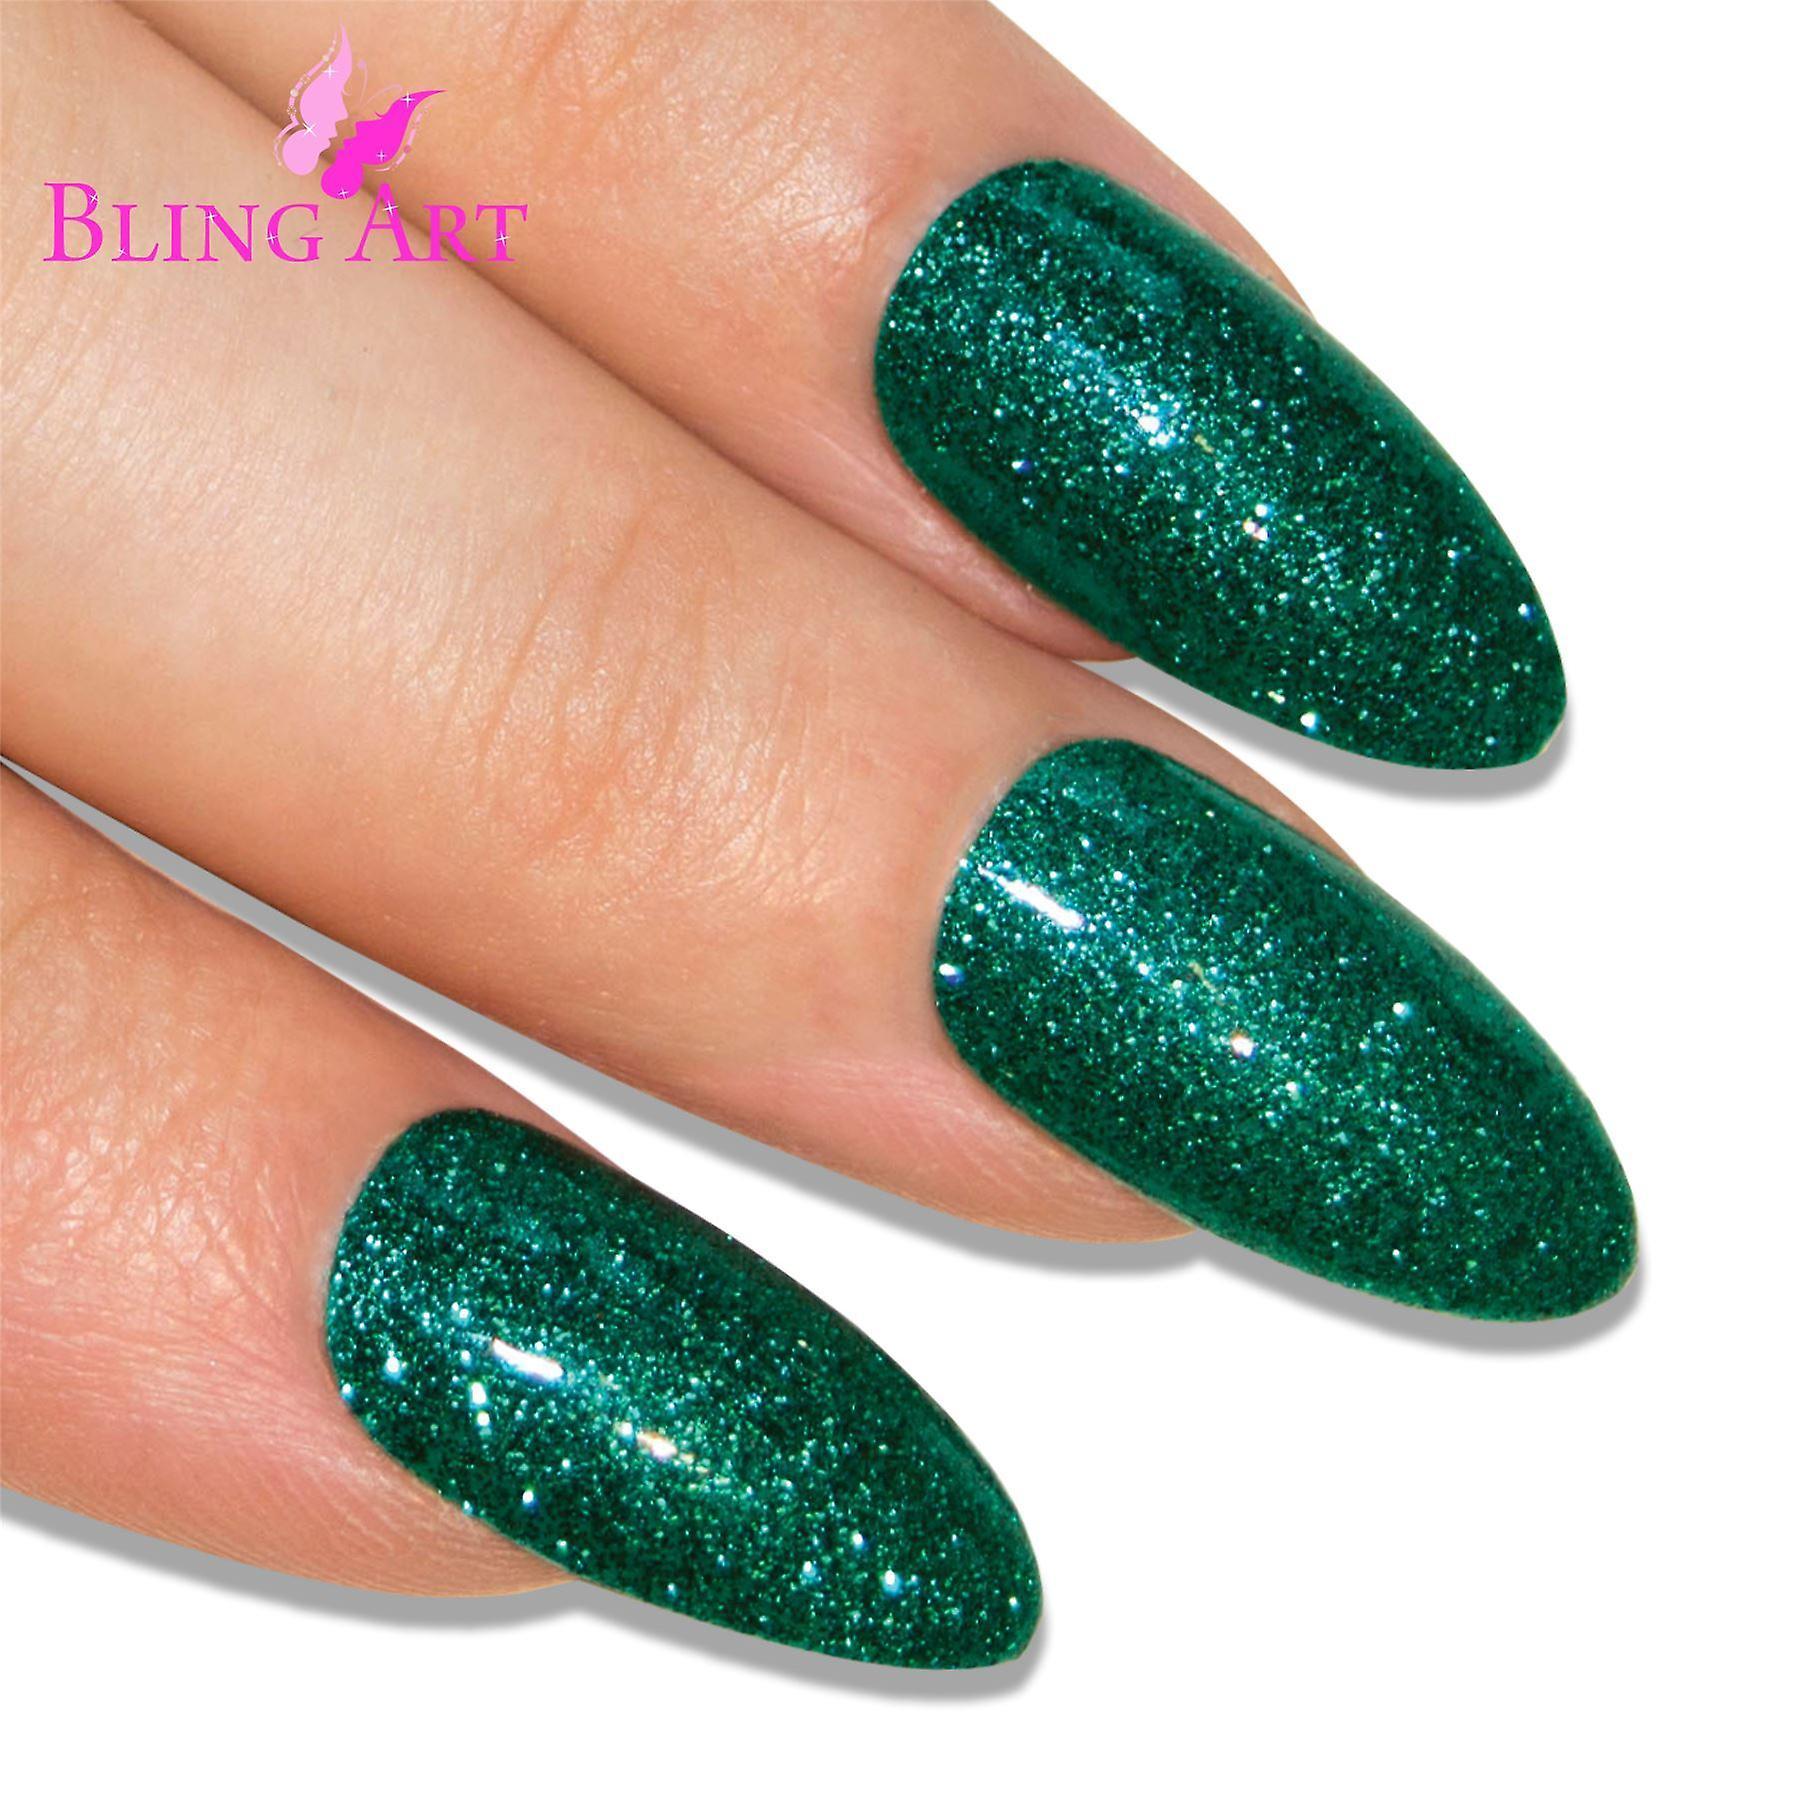 False nails bling art green gel almond stiletto long fake acrylic tips with glue